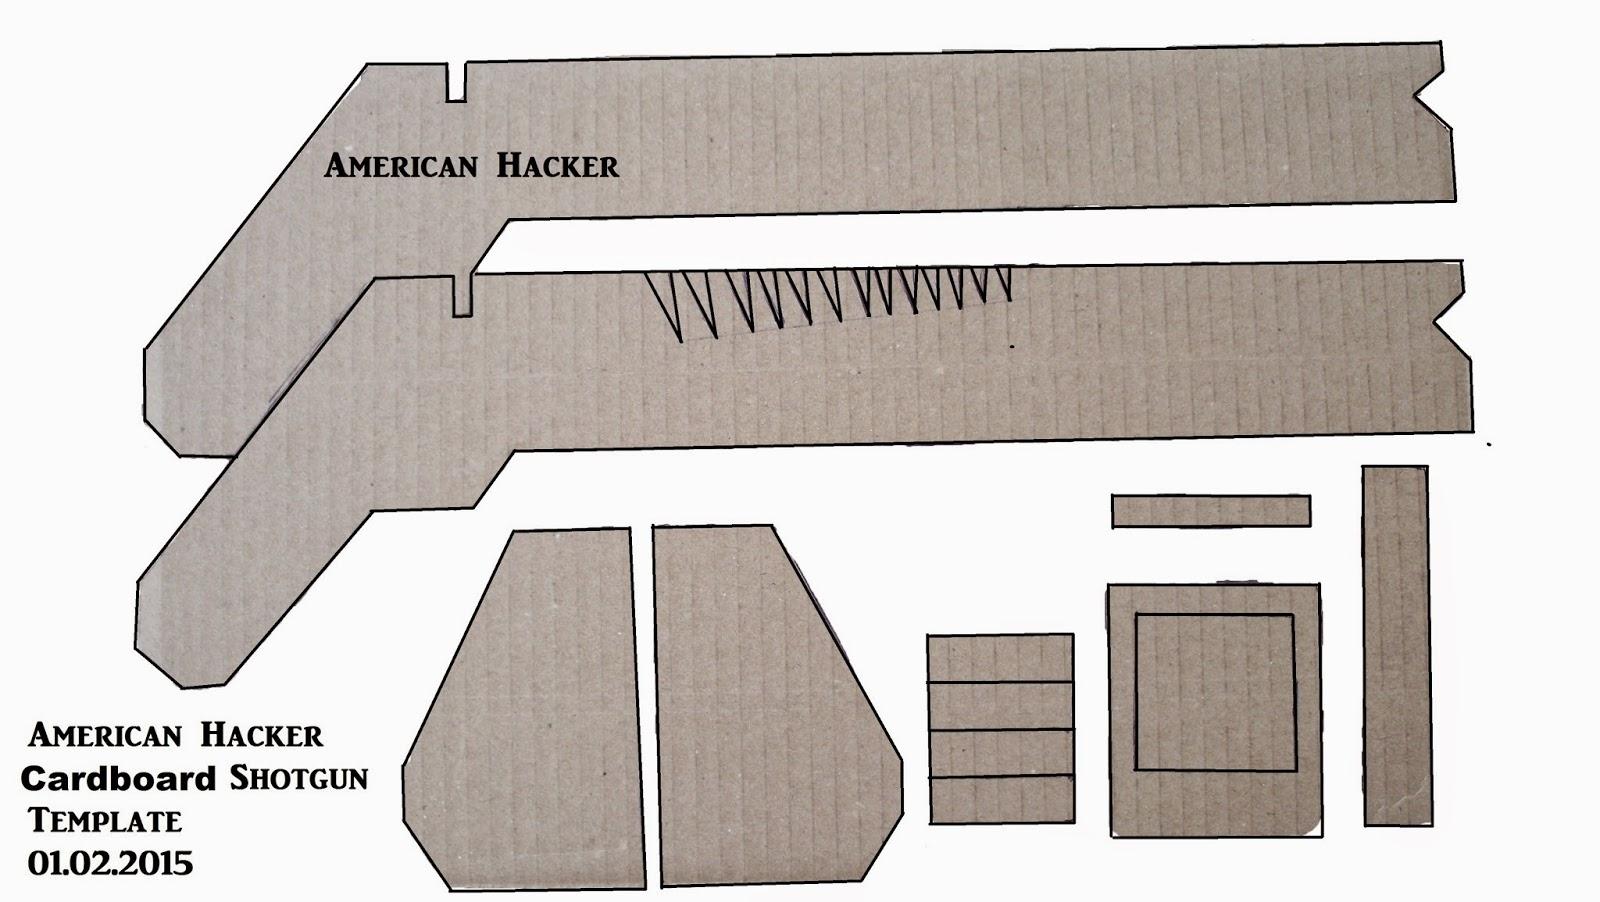 american hacker cardboard shotgun template